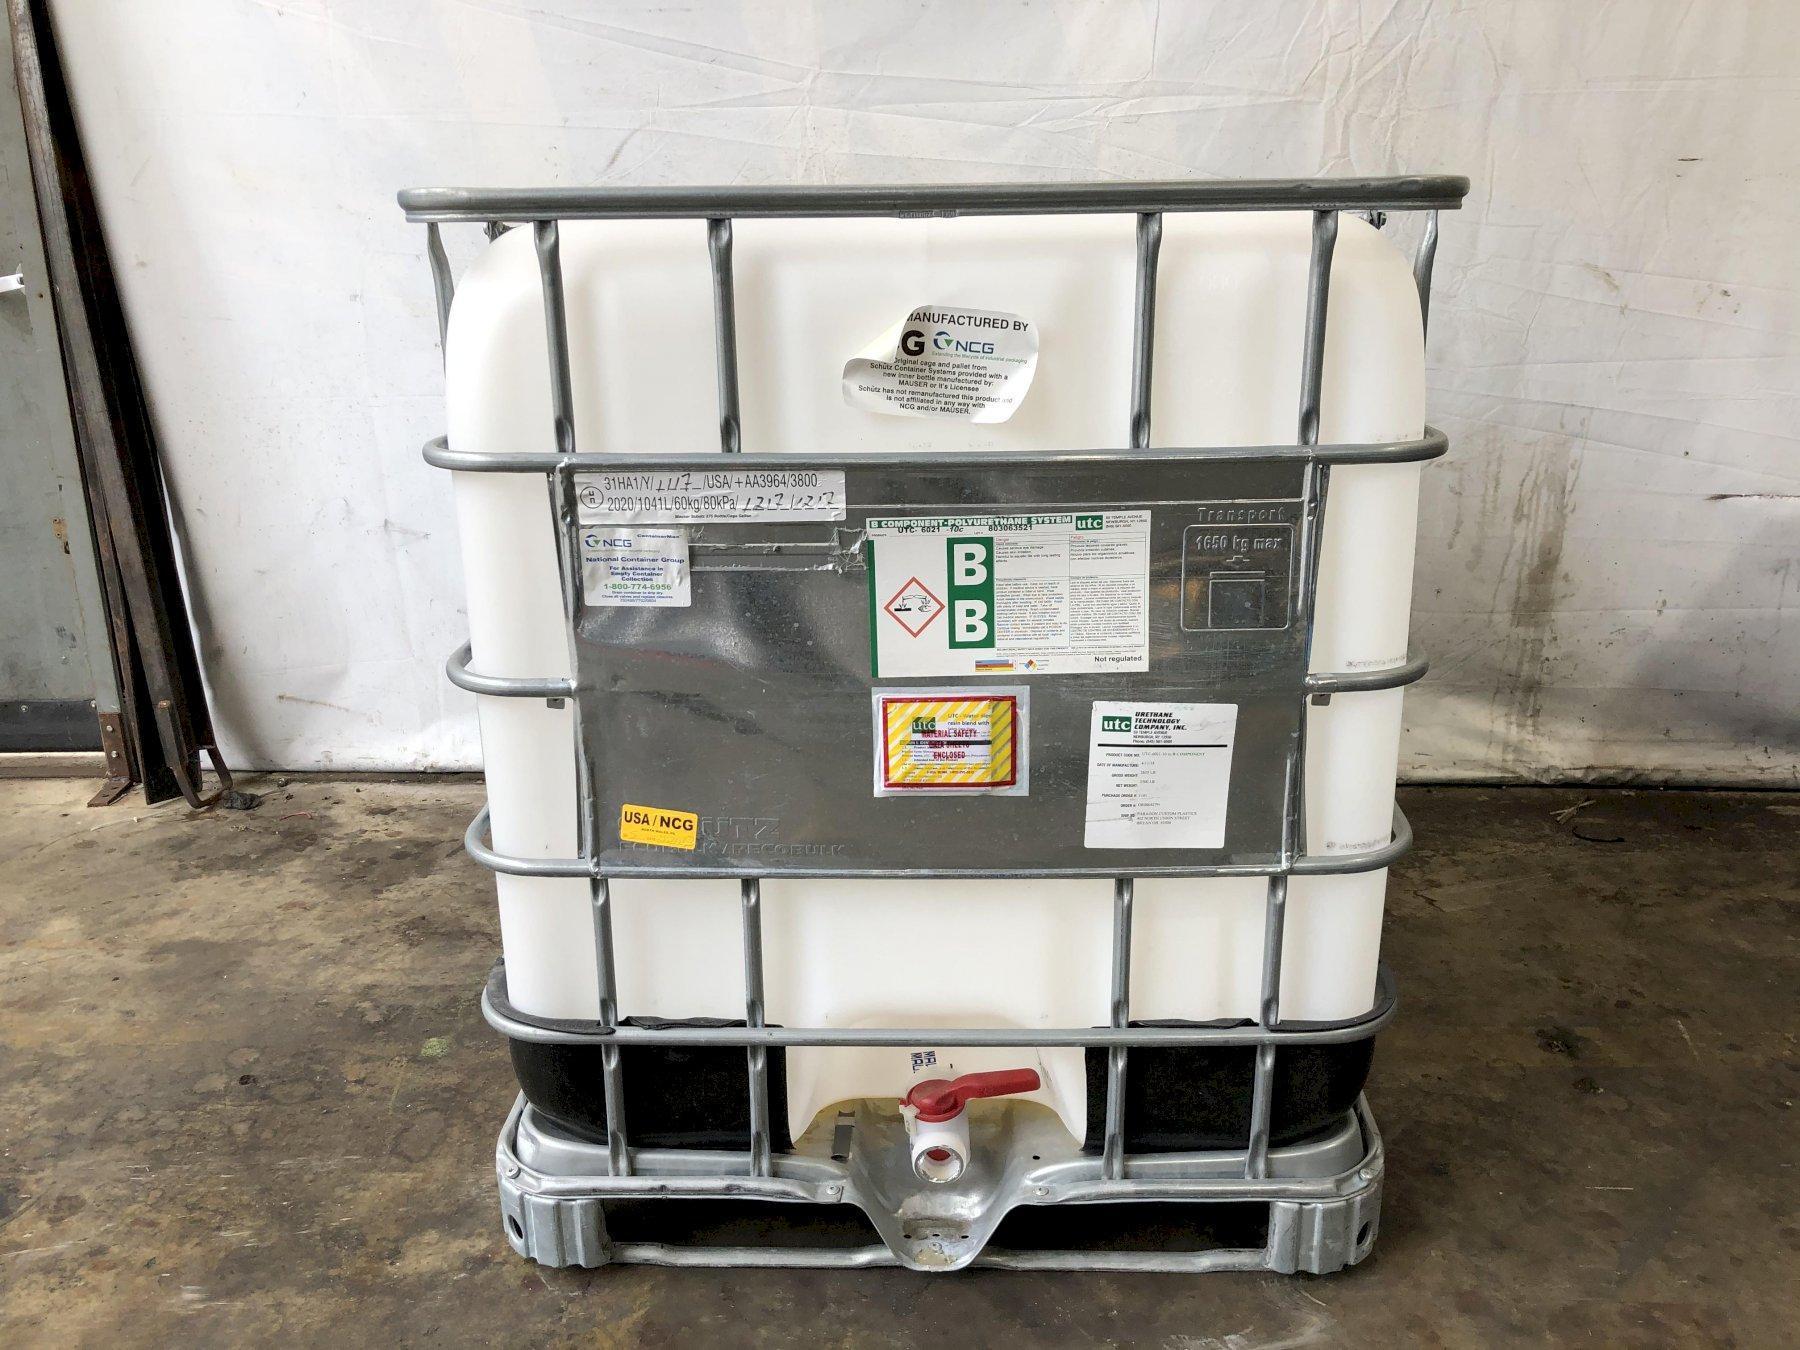 (48) 250 GALLON IBC WATER PLASTIC TOTES: STOCK #13496